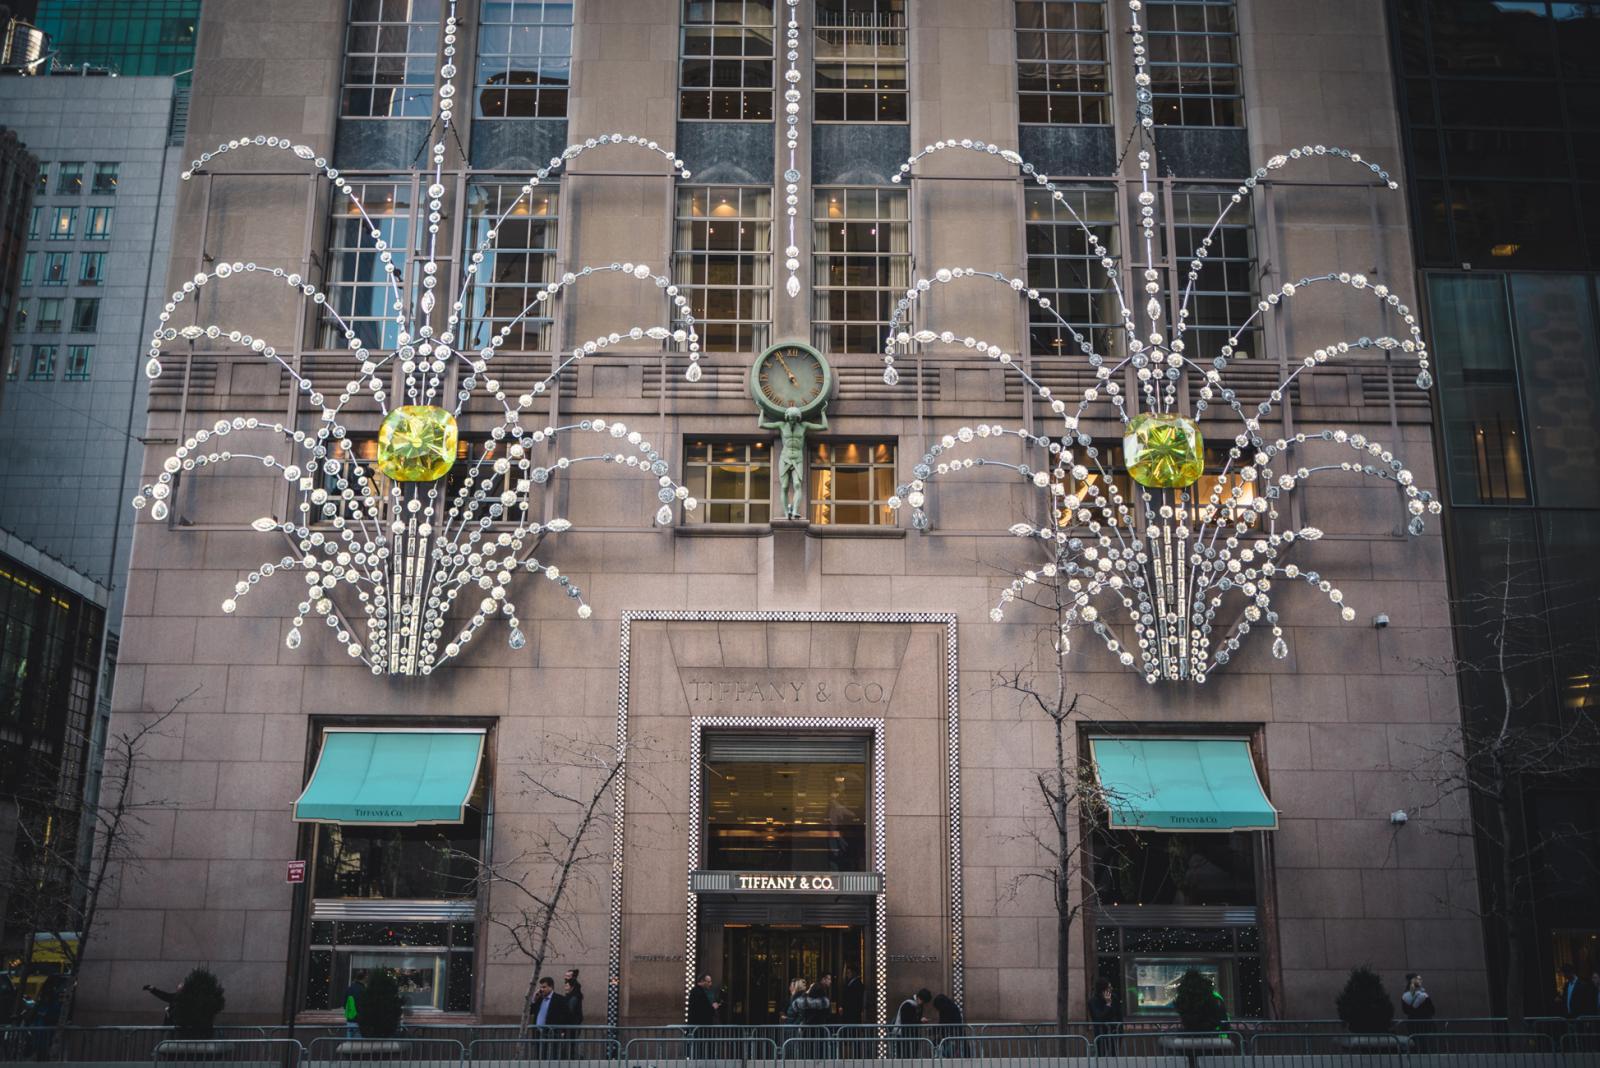 Holiday Windows in New York